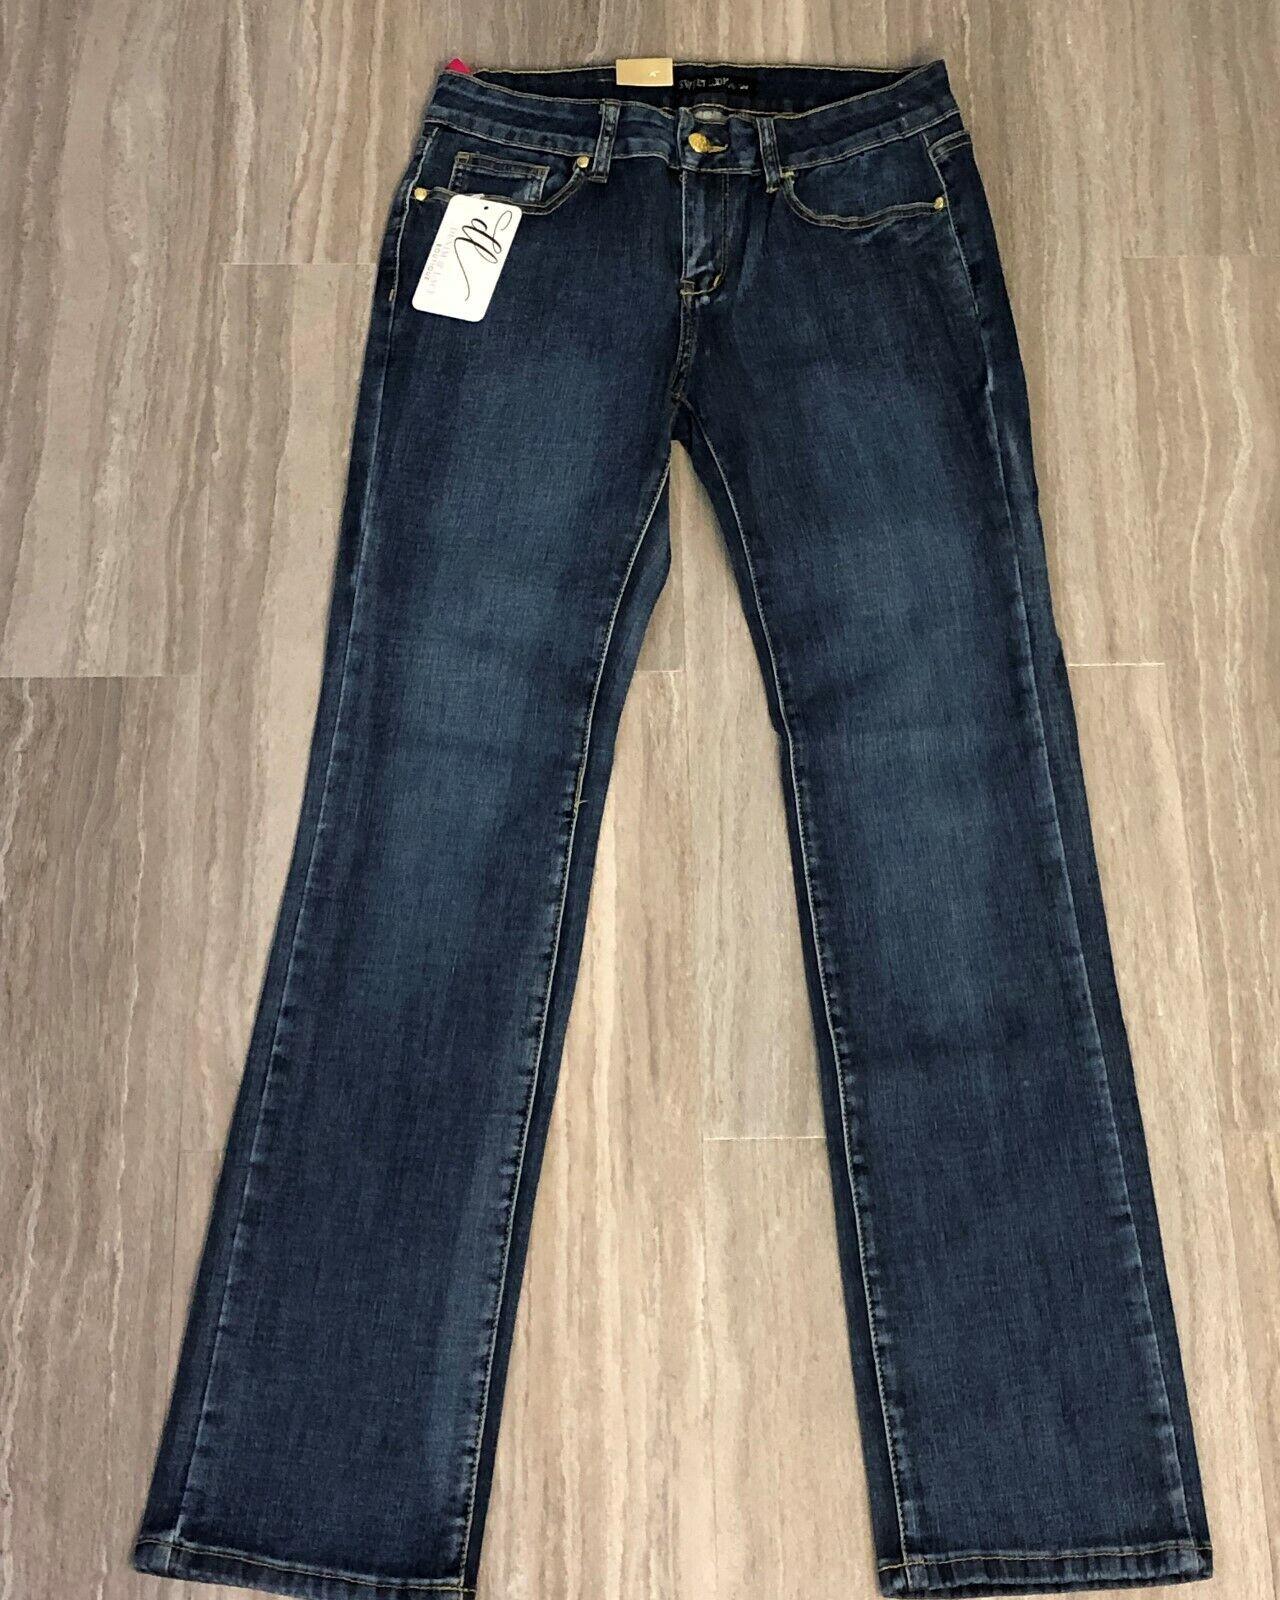 Bulk Sweet Look Premium Edition Women's Jean (Size 3-15) BootCut